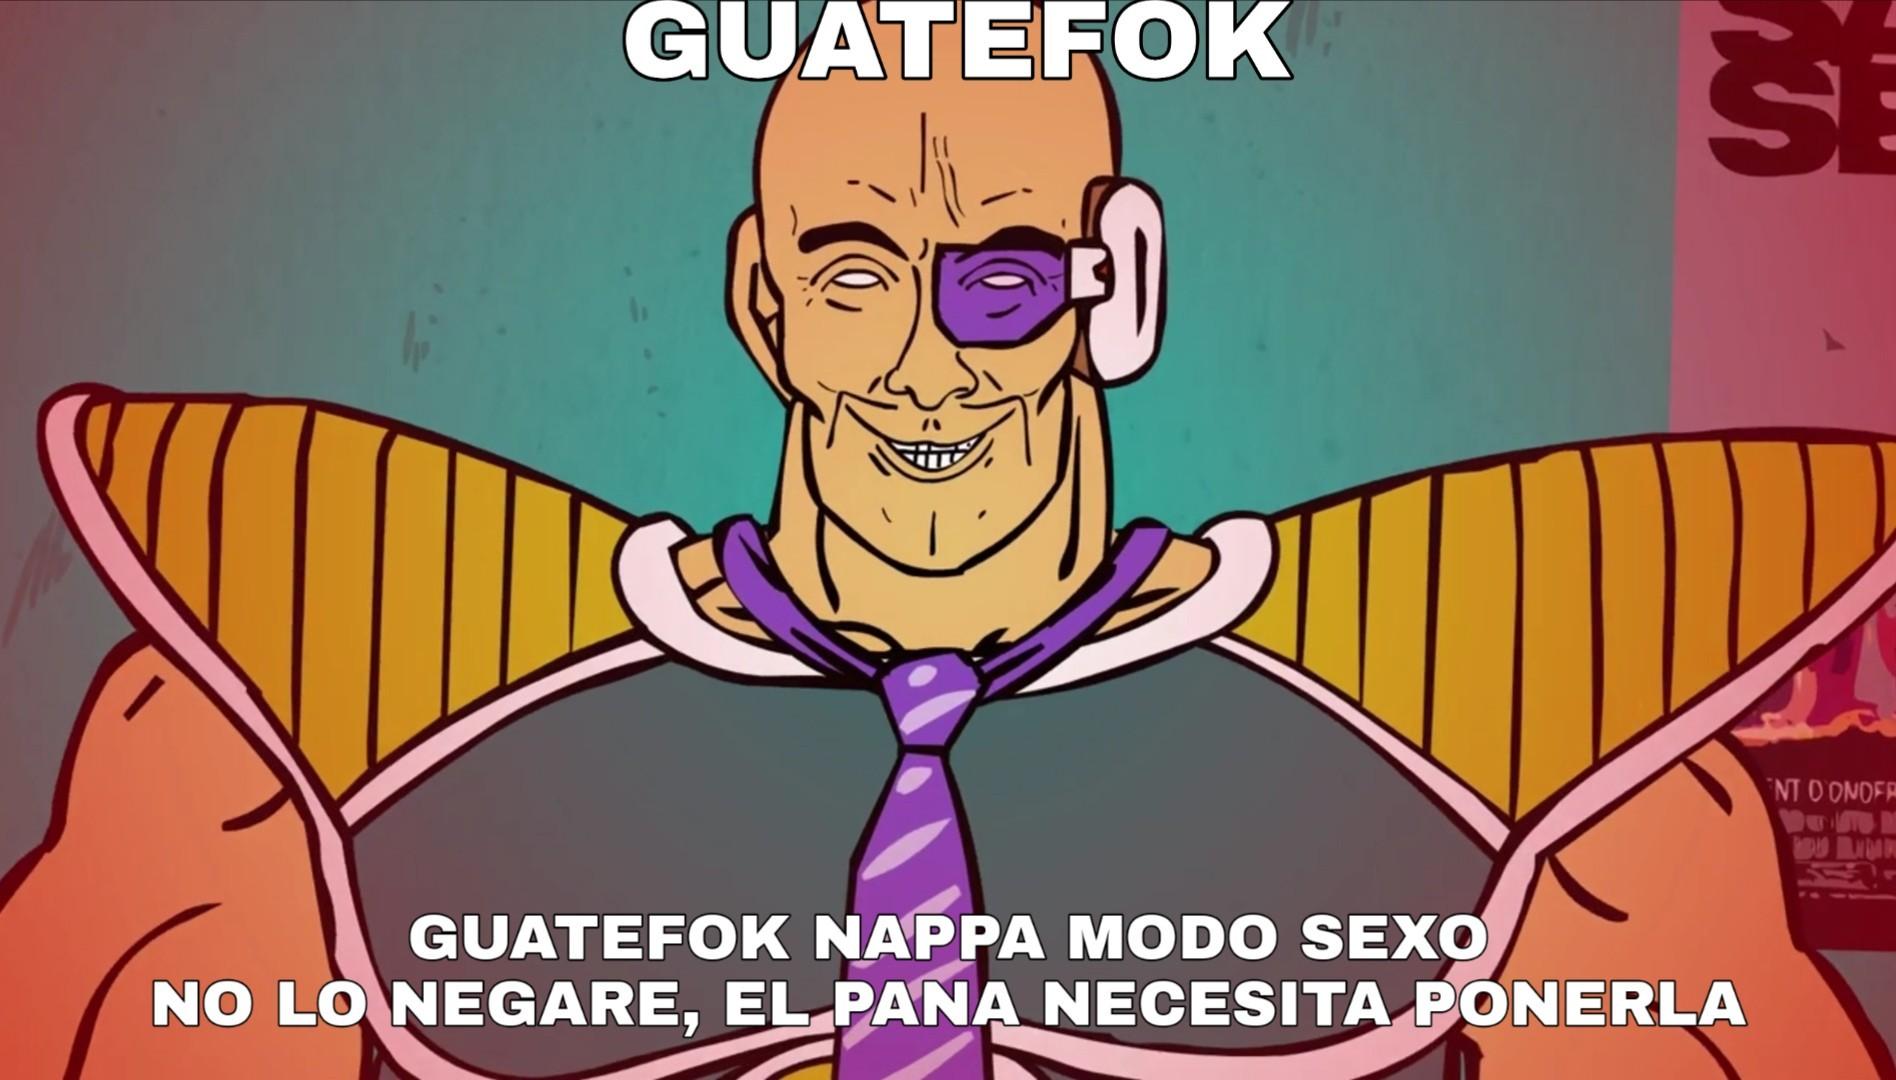 GUATEFOK - meme